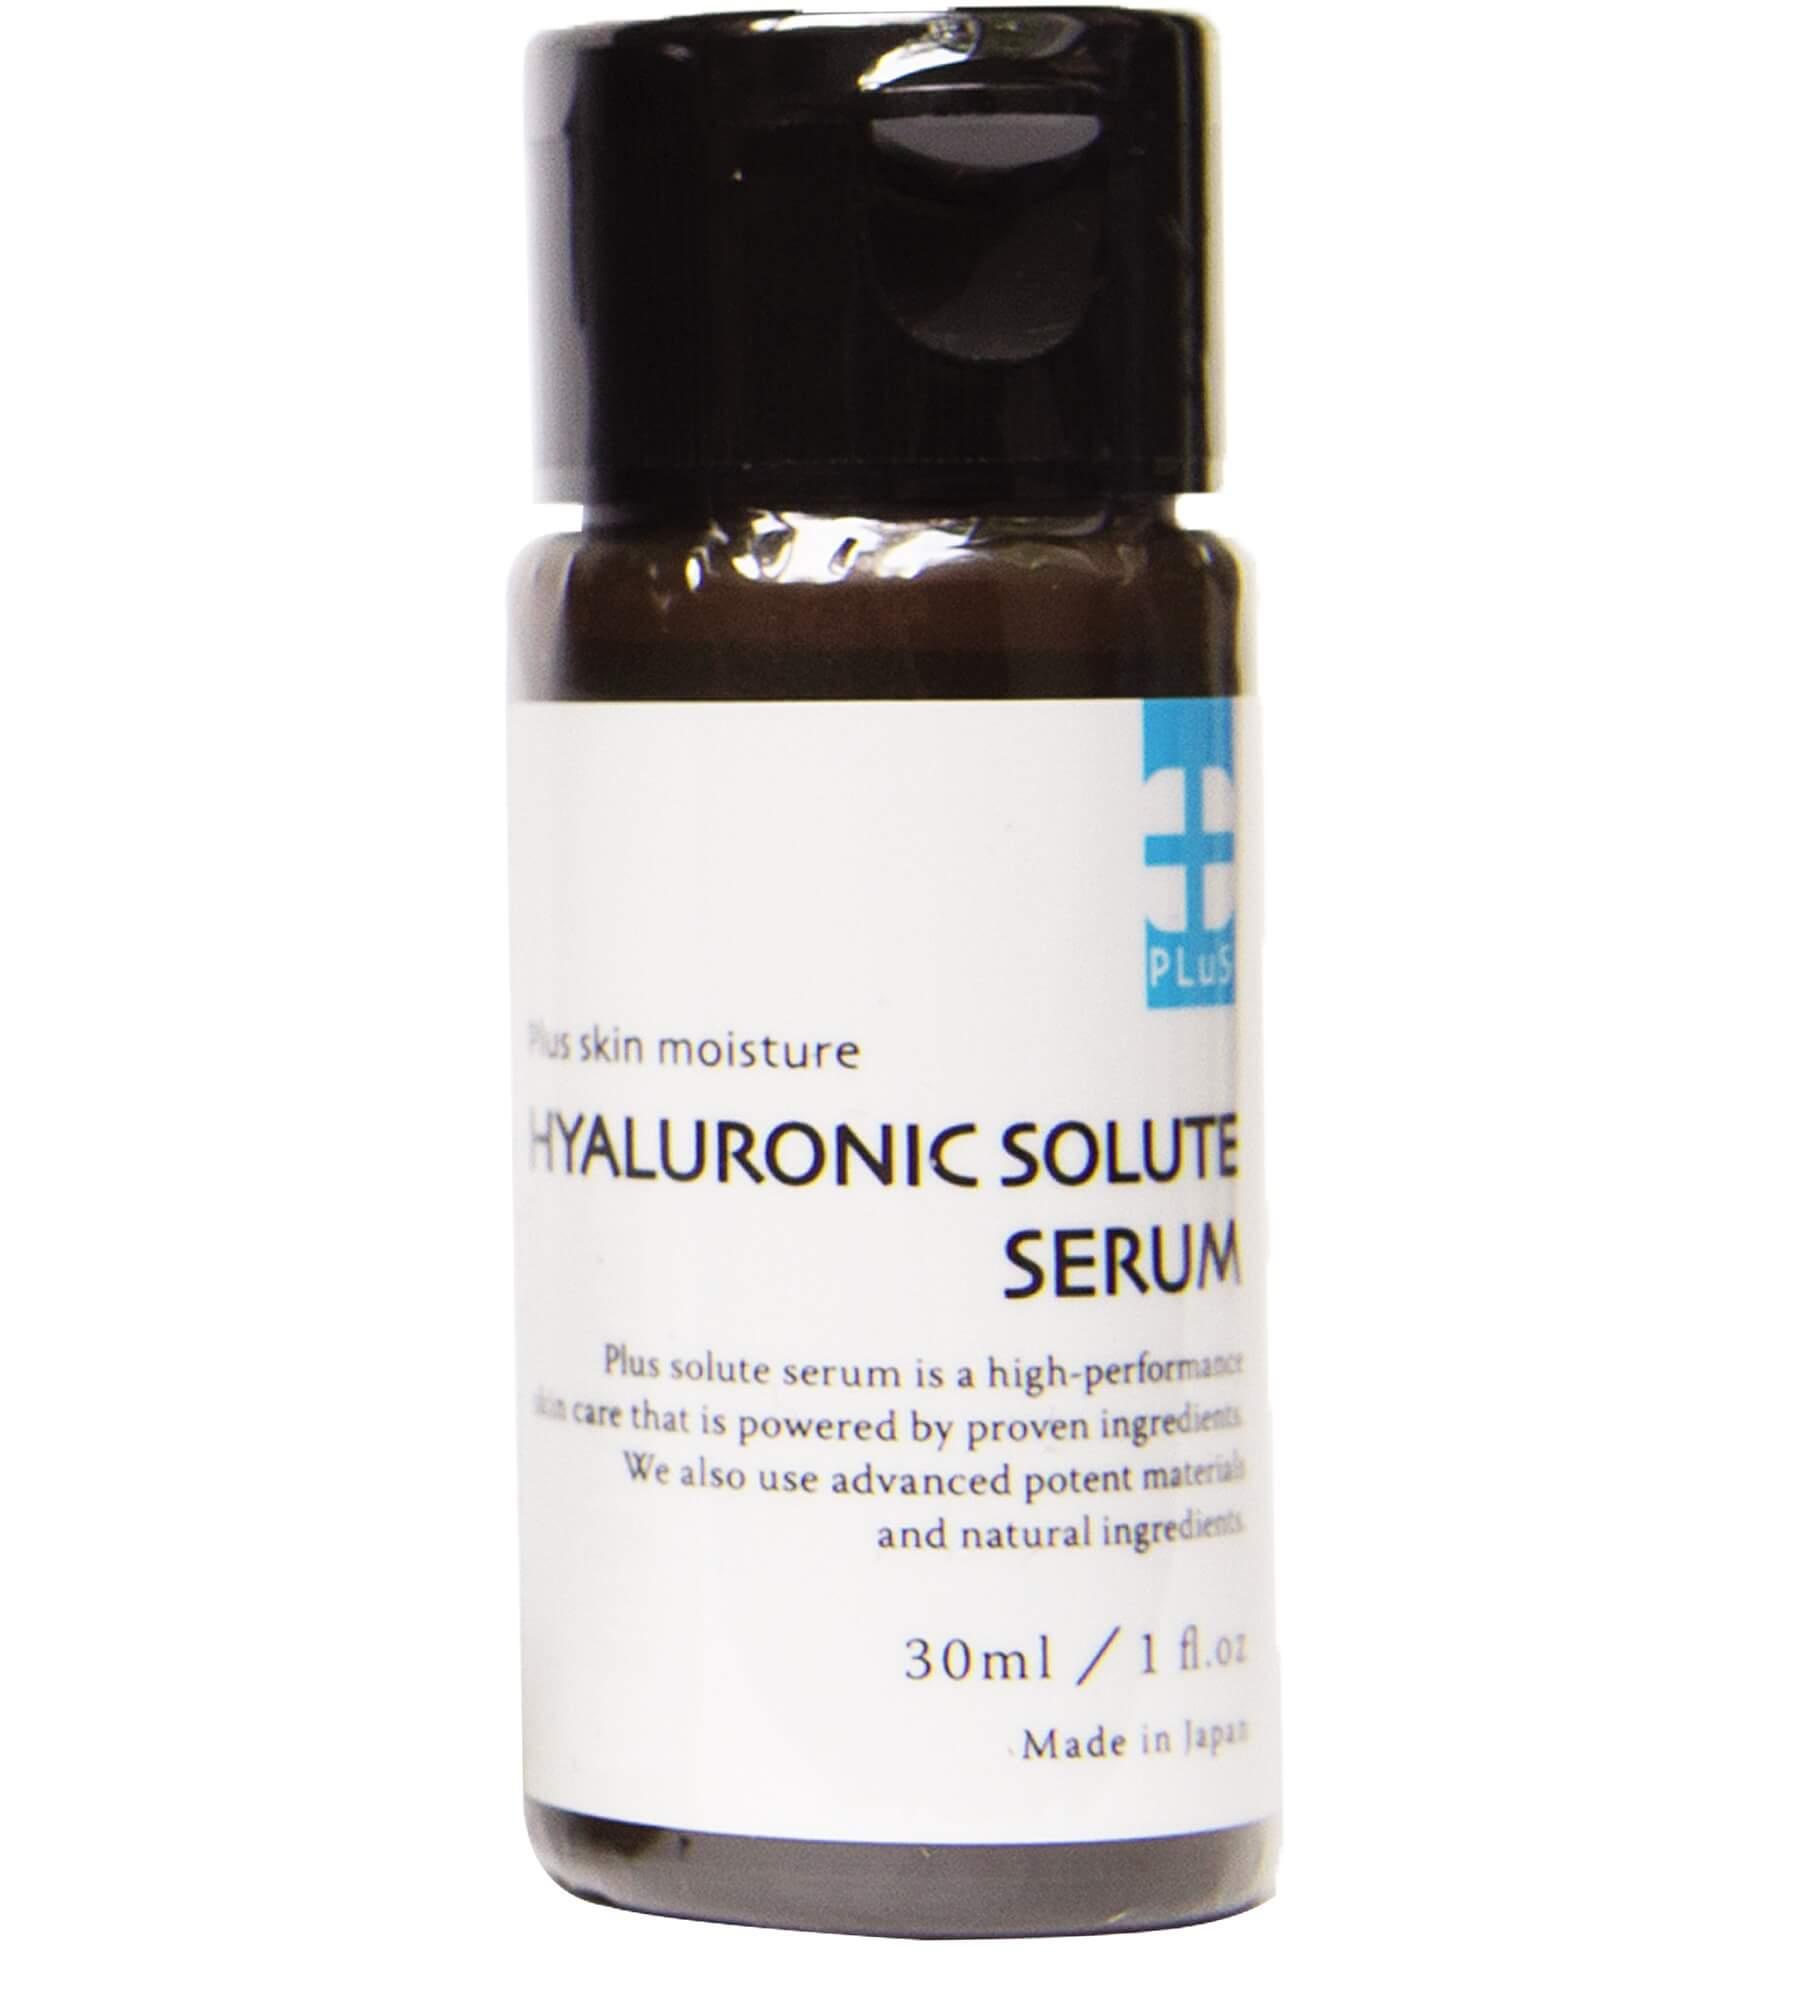 Serum dưỡng da của Nhật - Plus Hyaluranic Solute